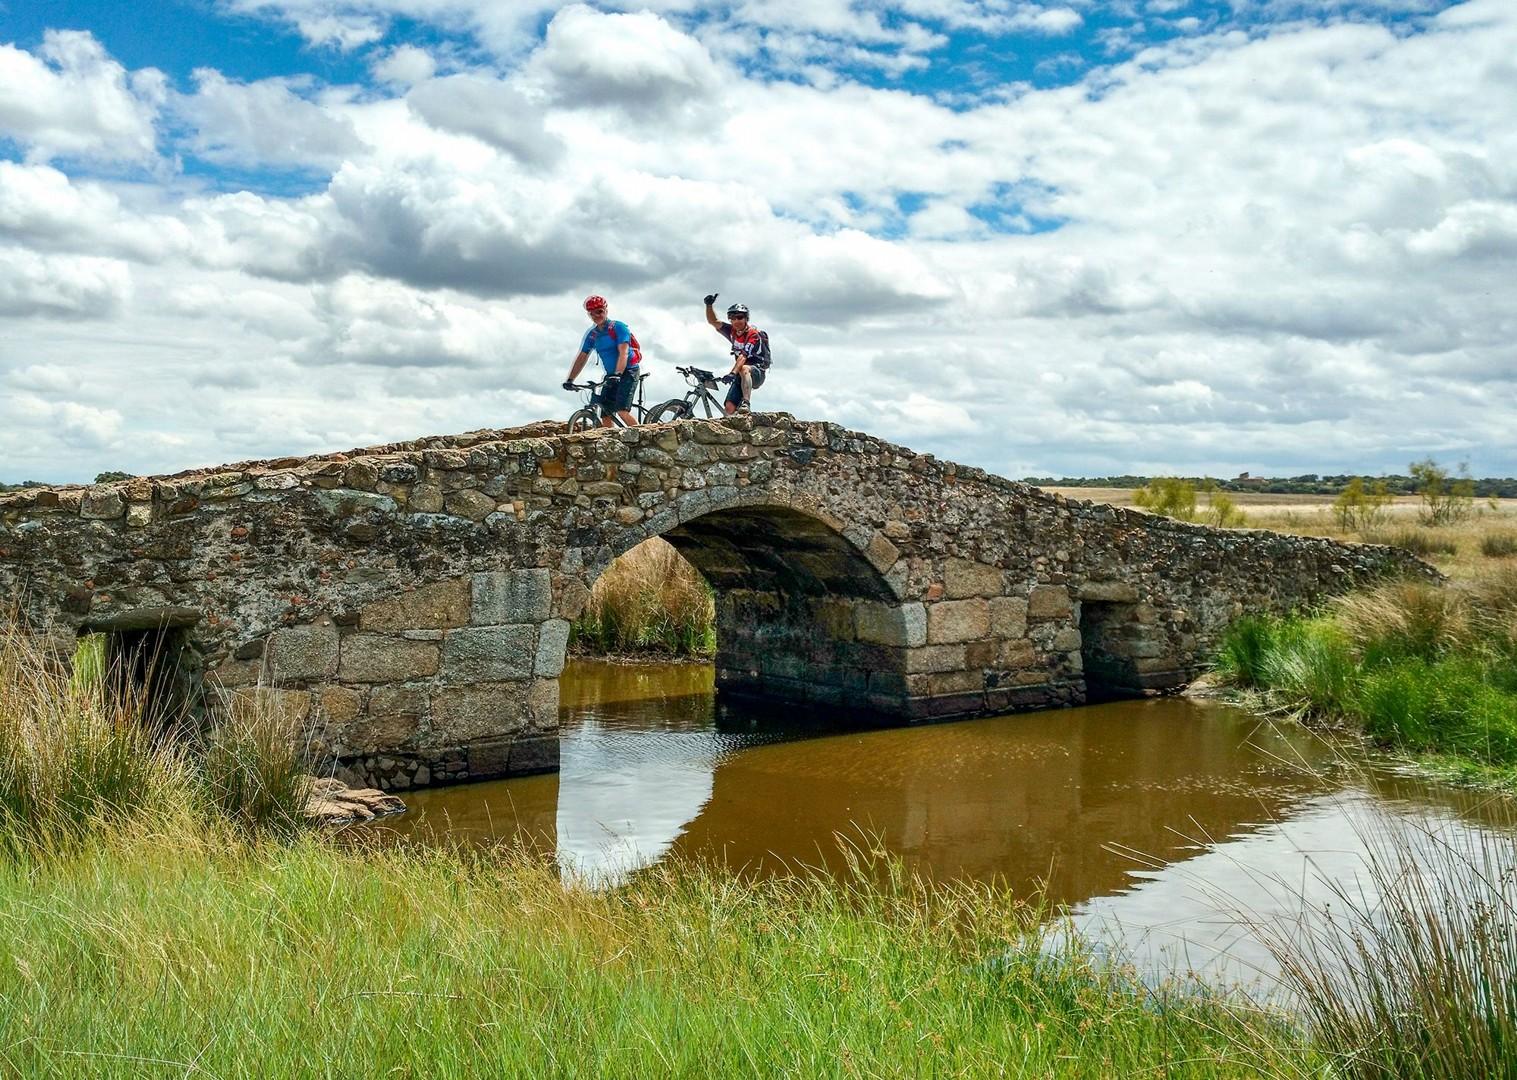 IMG_20170510_134112500_HDR.jpg - Spain - Ruta de la Plata - Guided Mountain Bike Holiday - Mountain Biking